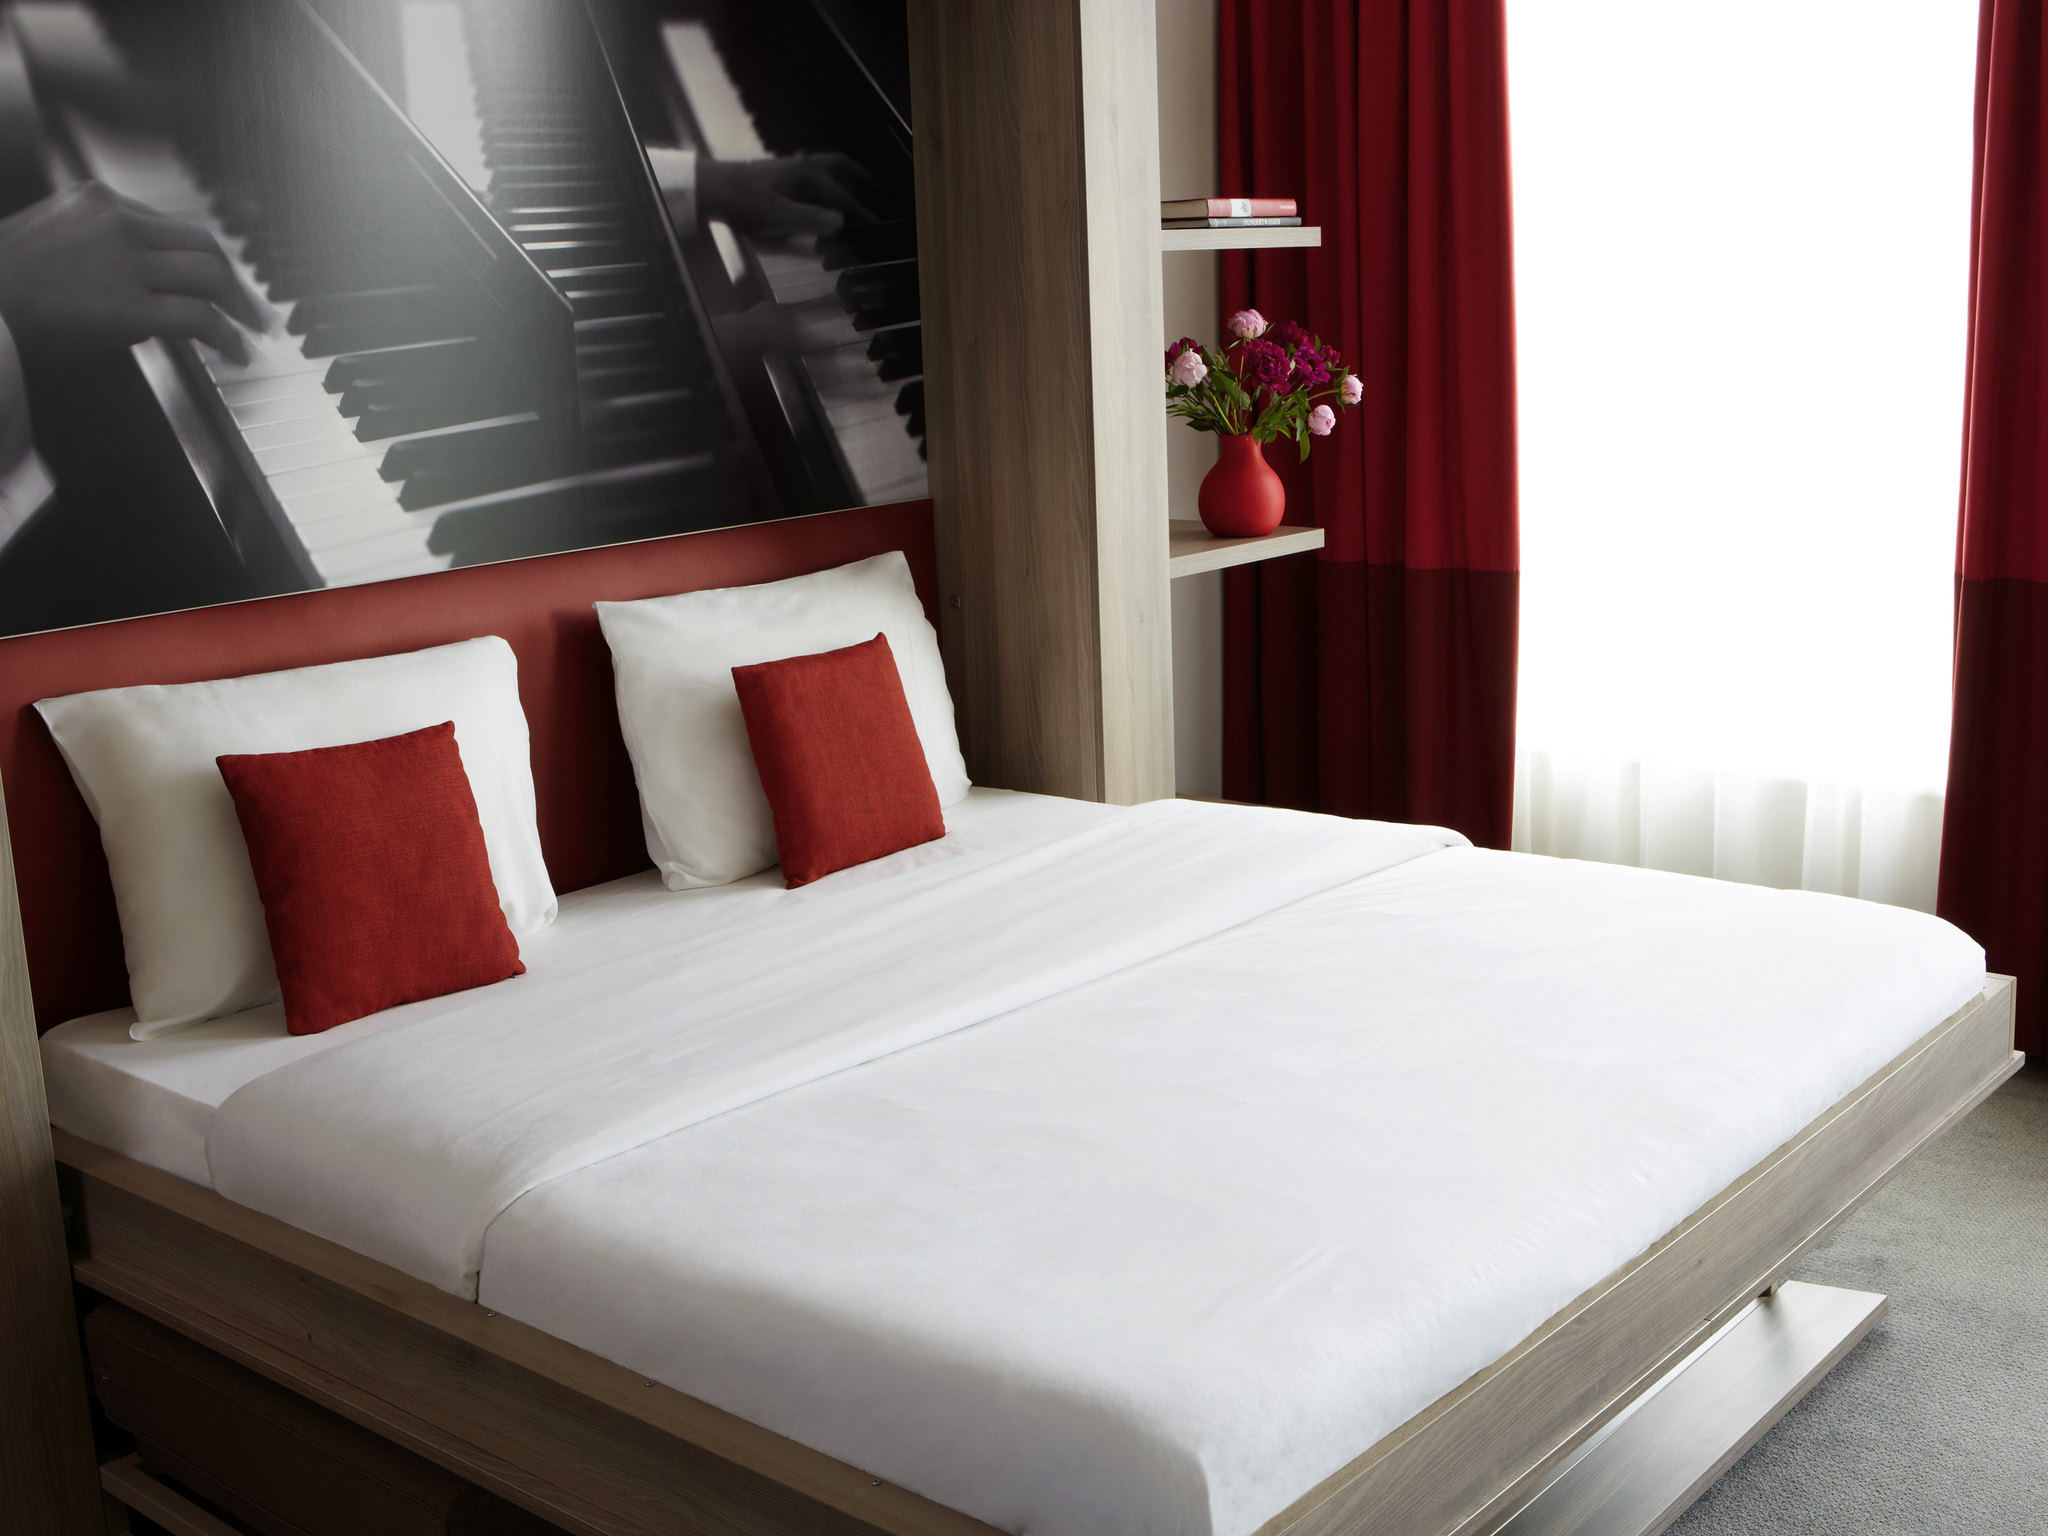 Hotel w mie cie wiede aparthotel adagio wien zentrum for Apart hotel adagio